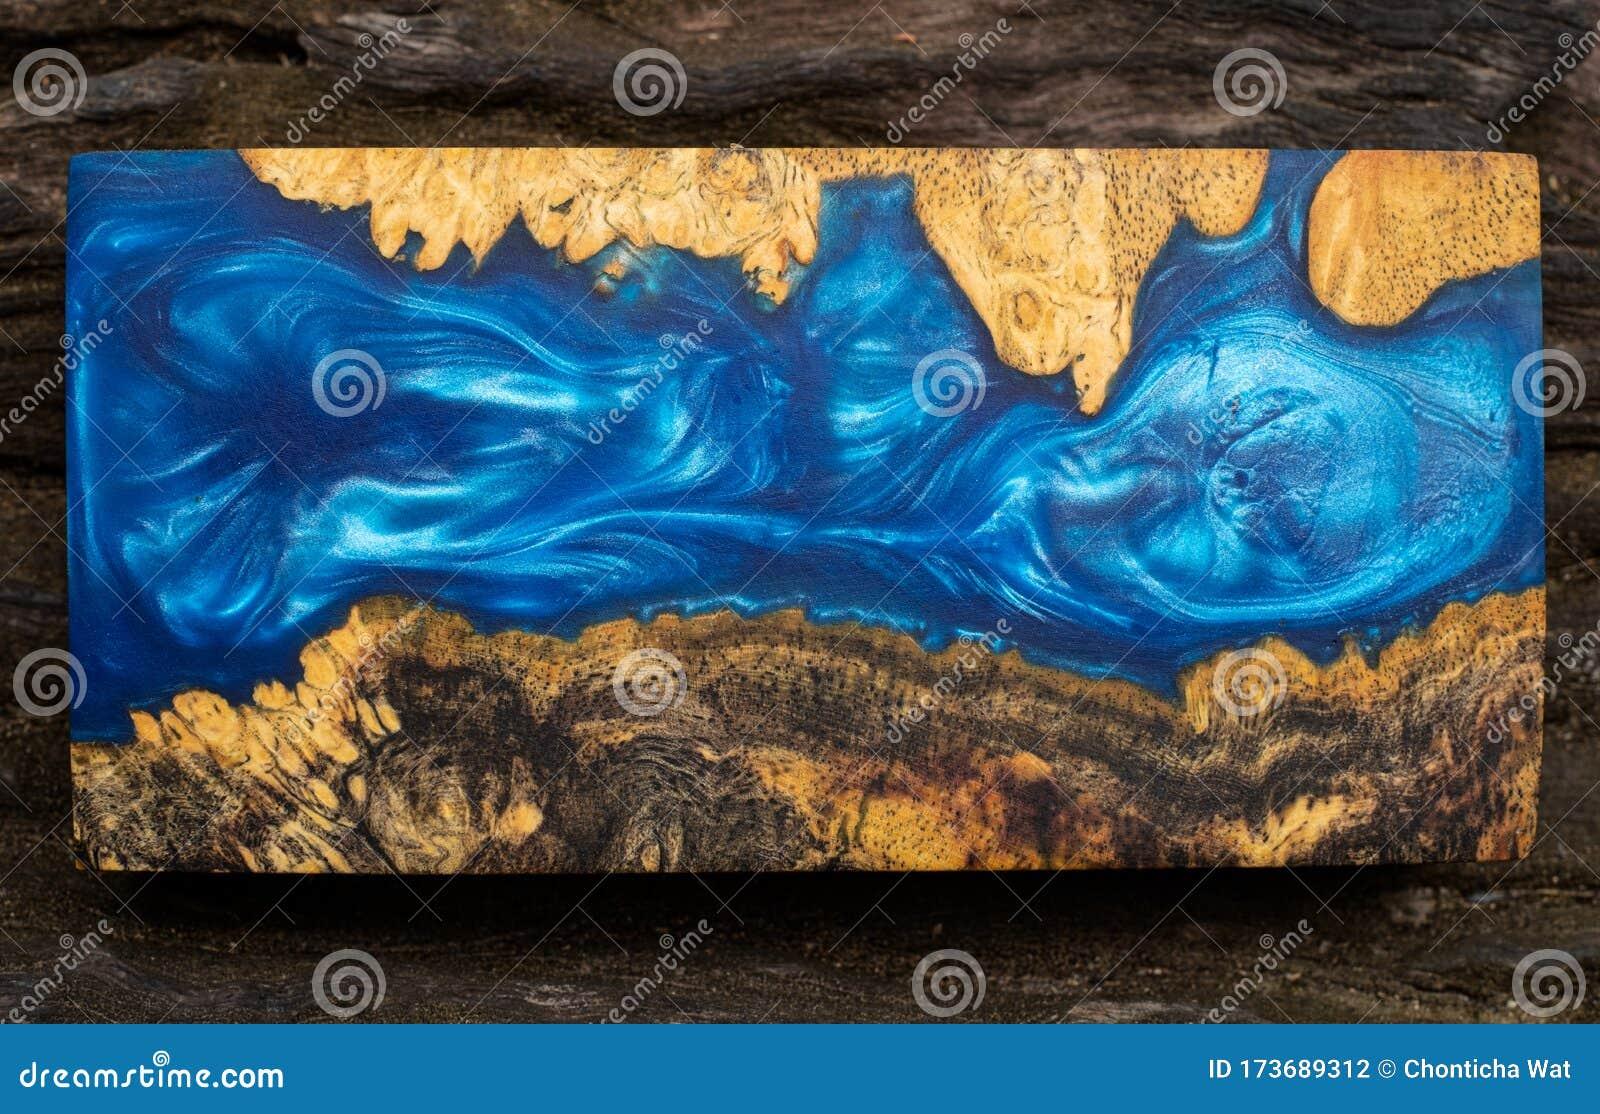 Casting Blue Epoxy Resin Burl Wood Cube On Old Table Art Background Stock Photo Image Of Metallic Modern 173689312